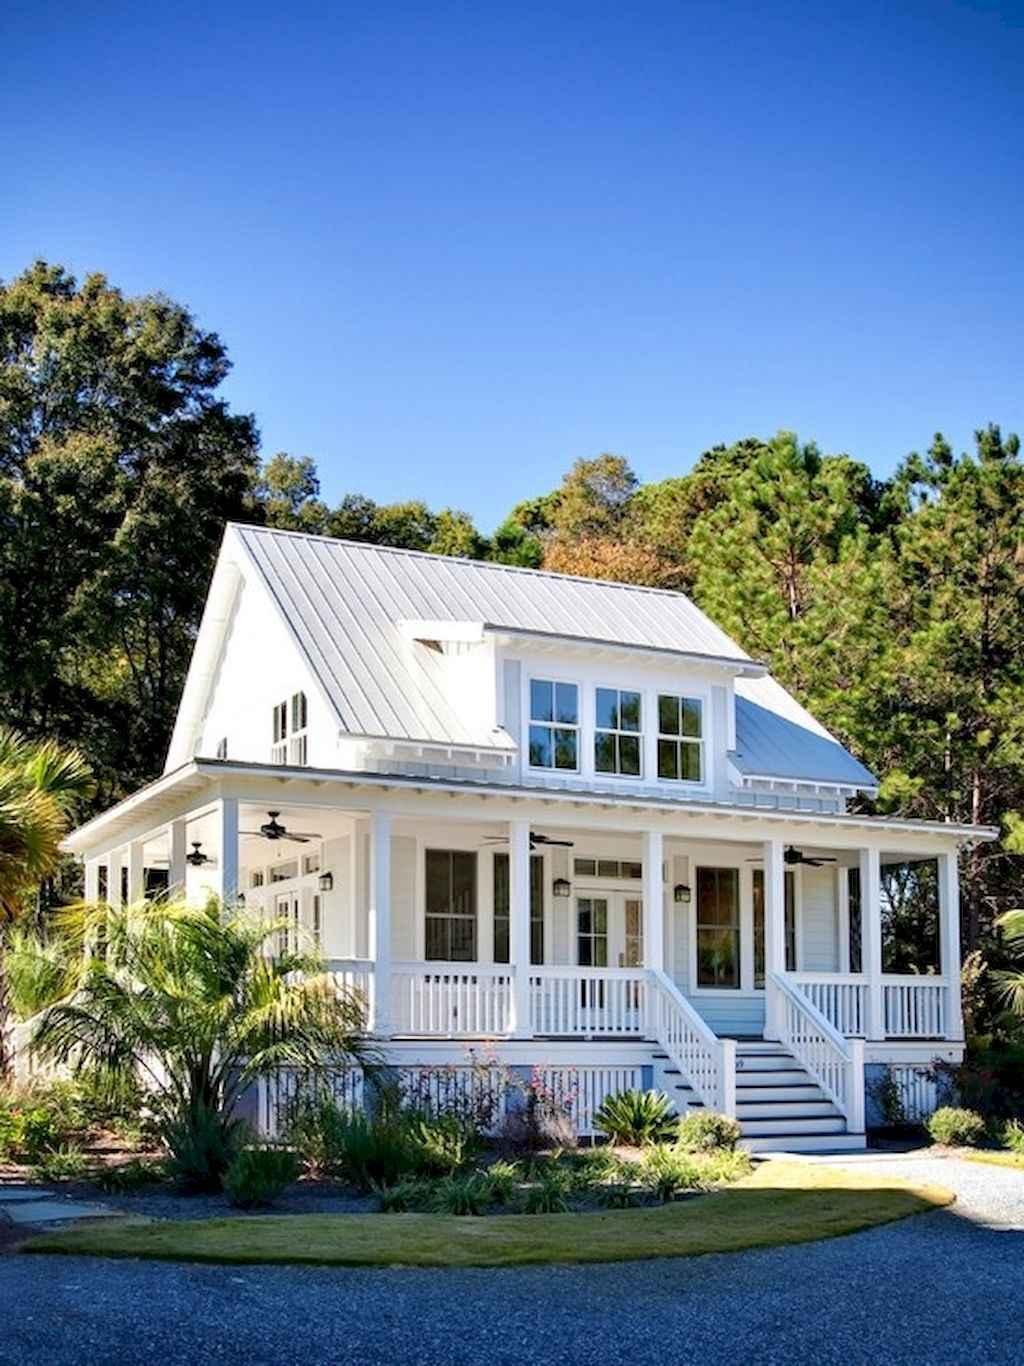 65 Stunning Farmhouse Porch Railing Decor Ideas 53